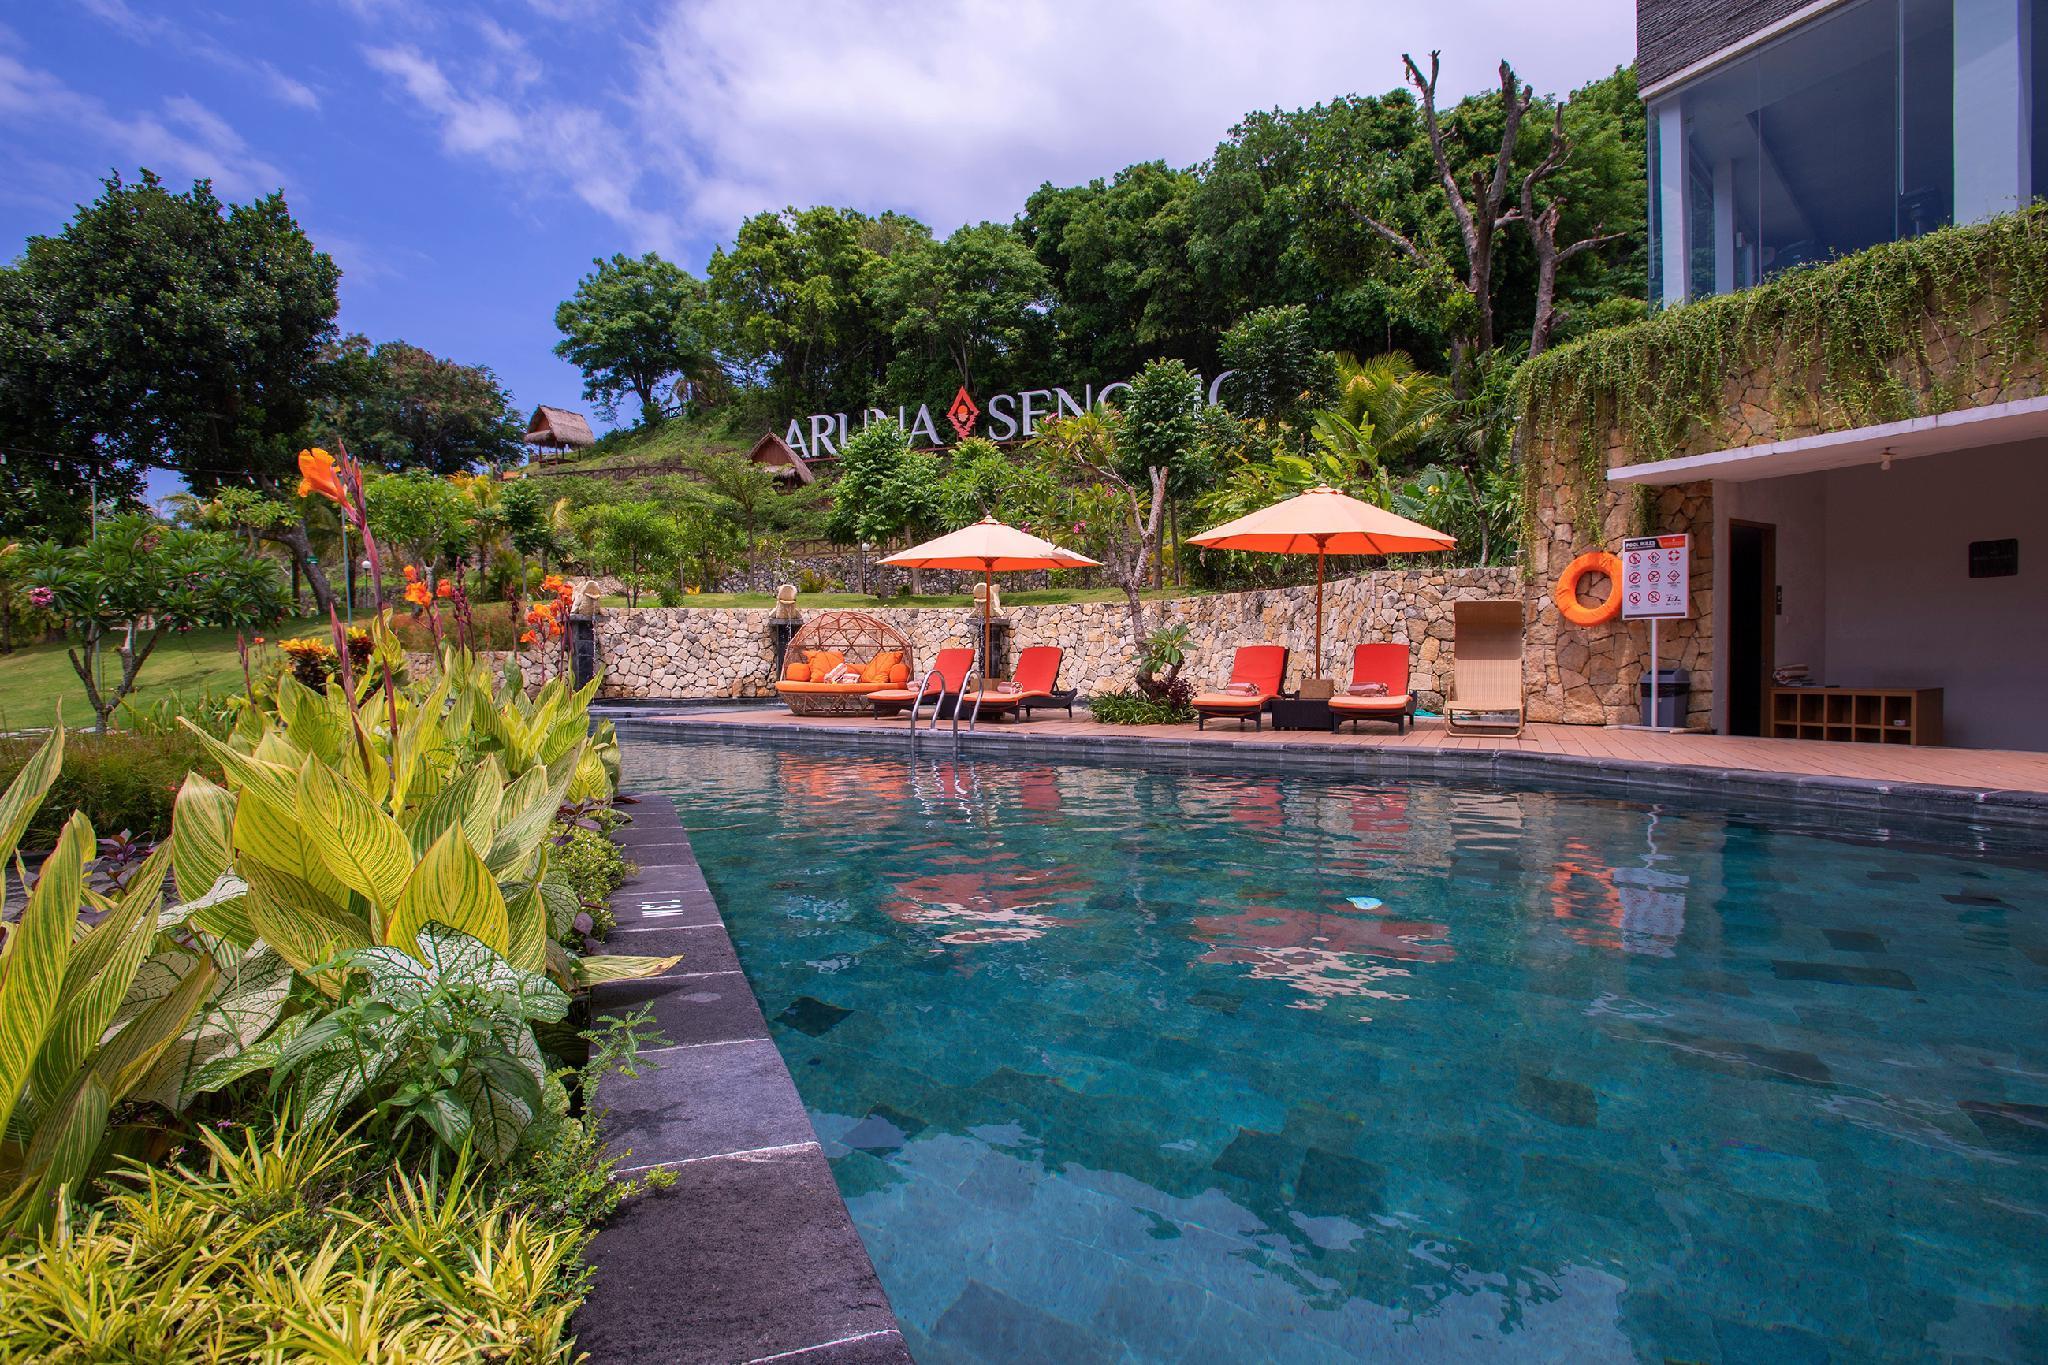 Aruna Senggigi Resort And Convention